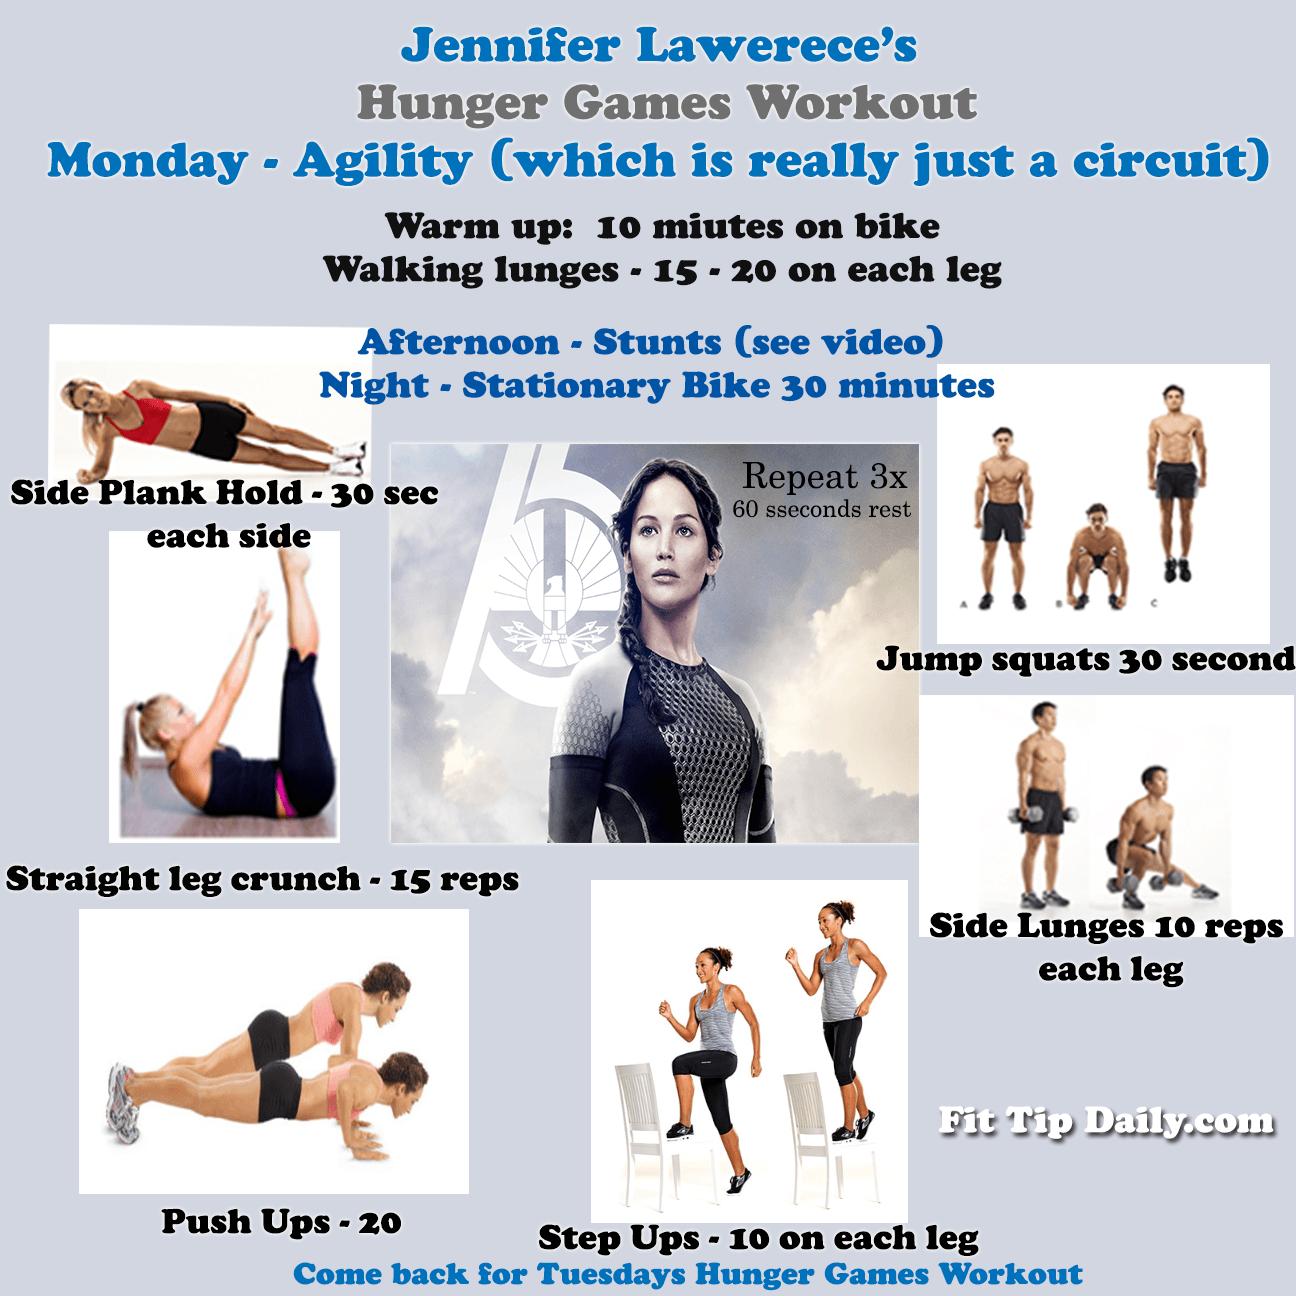 Workout Games: Jennifer Lawrence's Workout